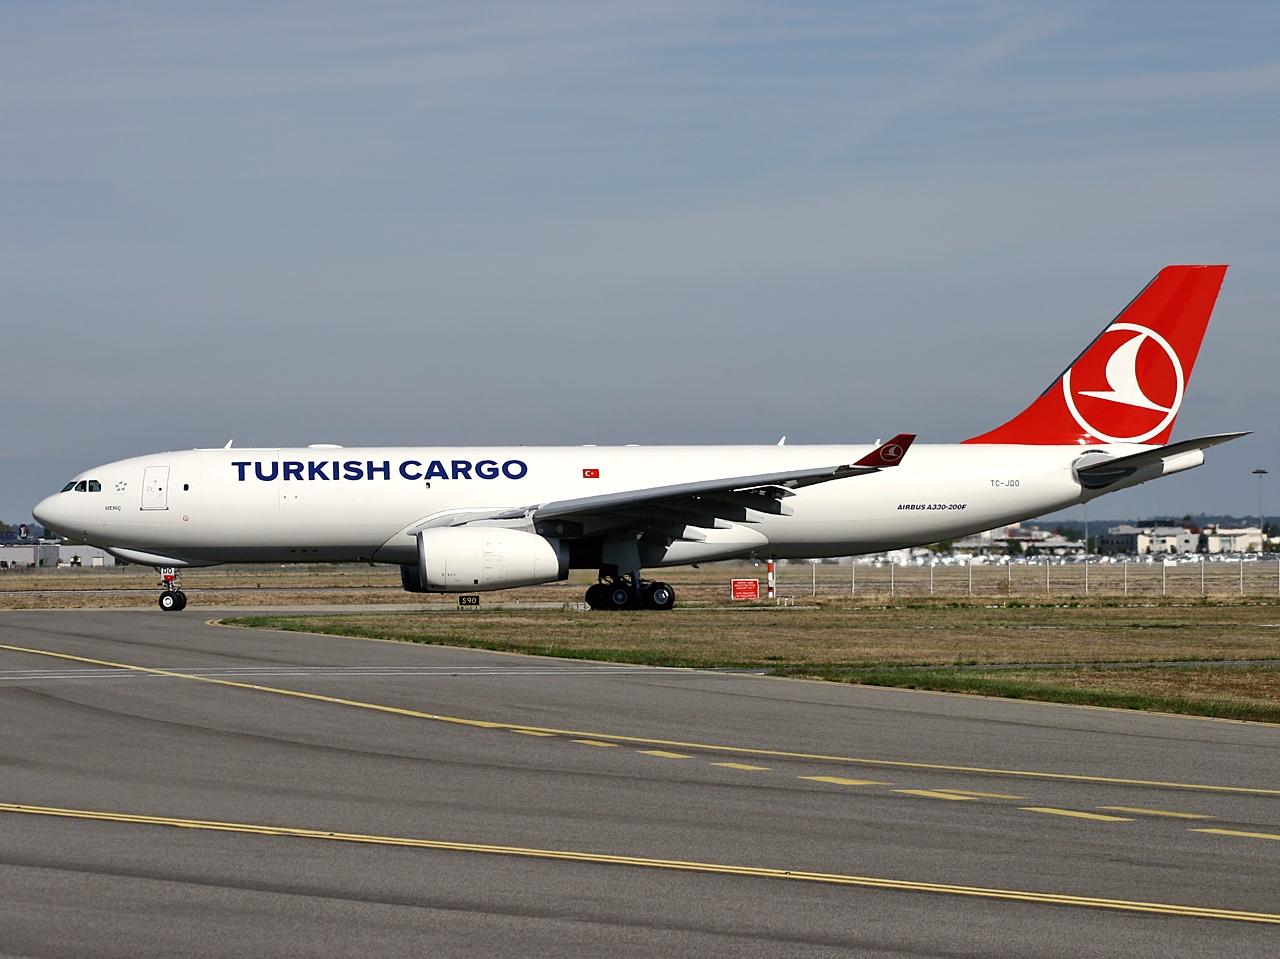 http://2.bp.blogspot.com/-CvcW5dcQJTY/T9IcbuzM5AI/AAAAAAAAJHk/jgVseWyKBSo/s1600/airbus_a330-200_turkish_cargo.jpg